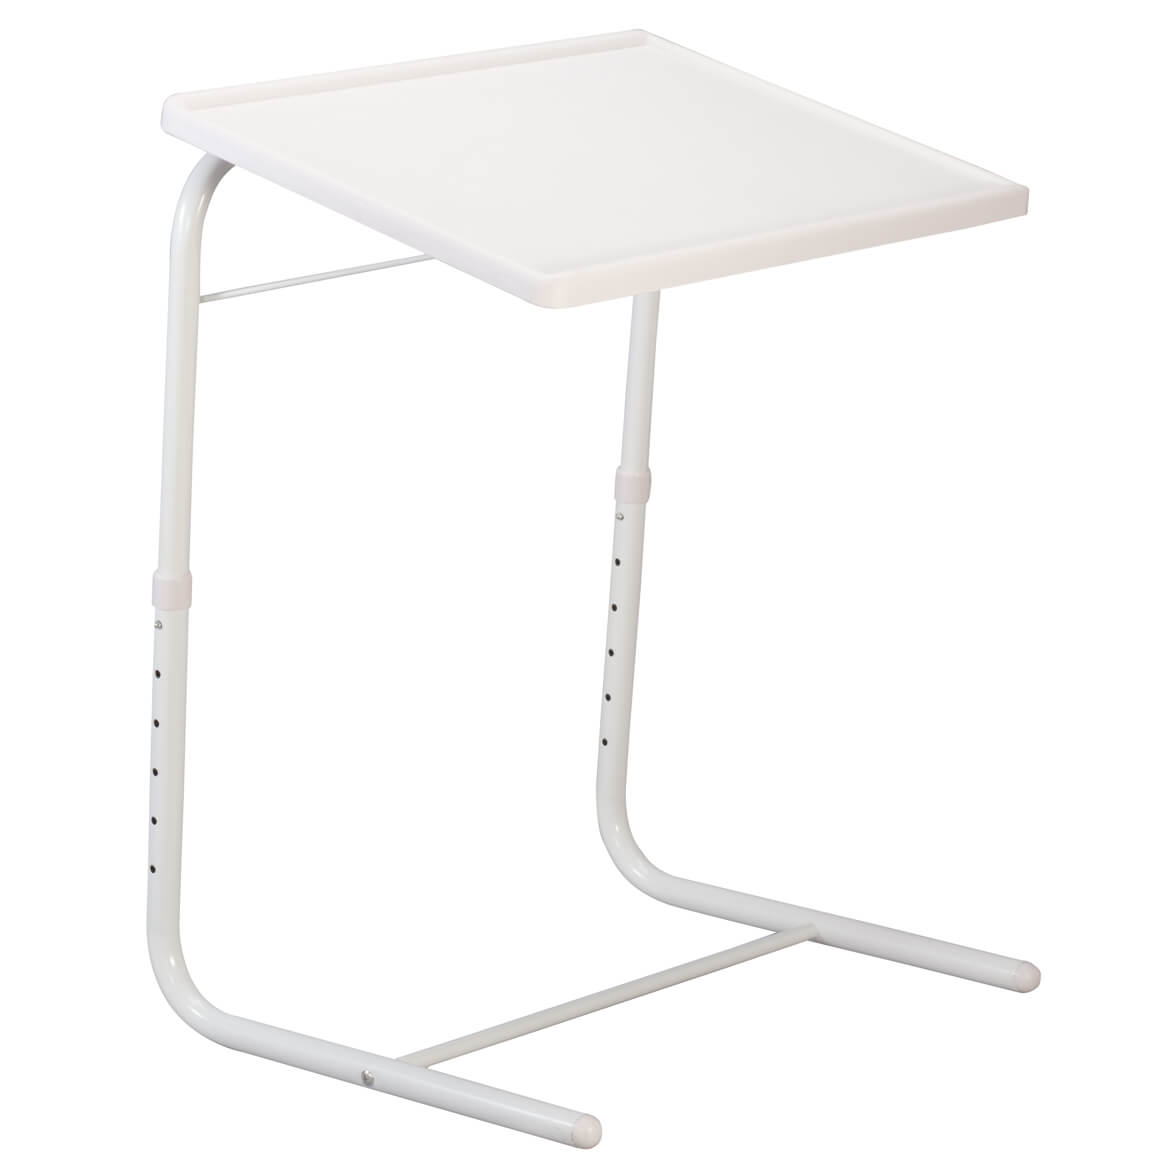 Adjule Tray Table